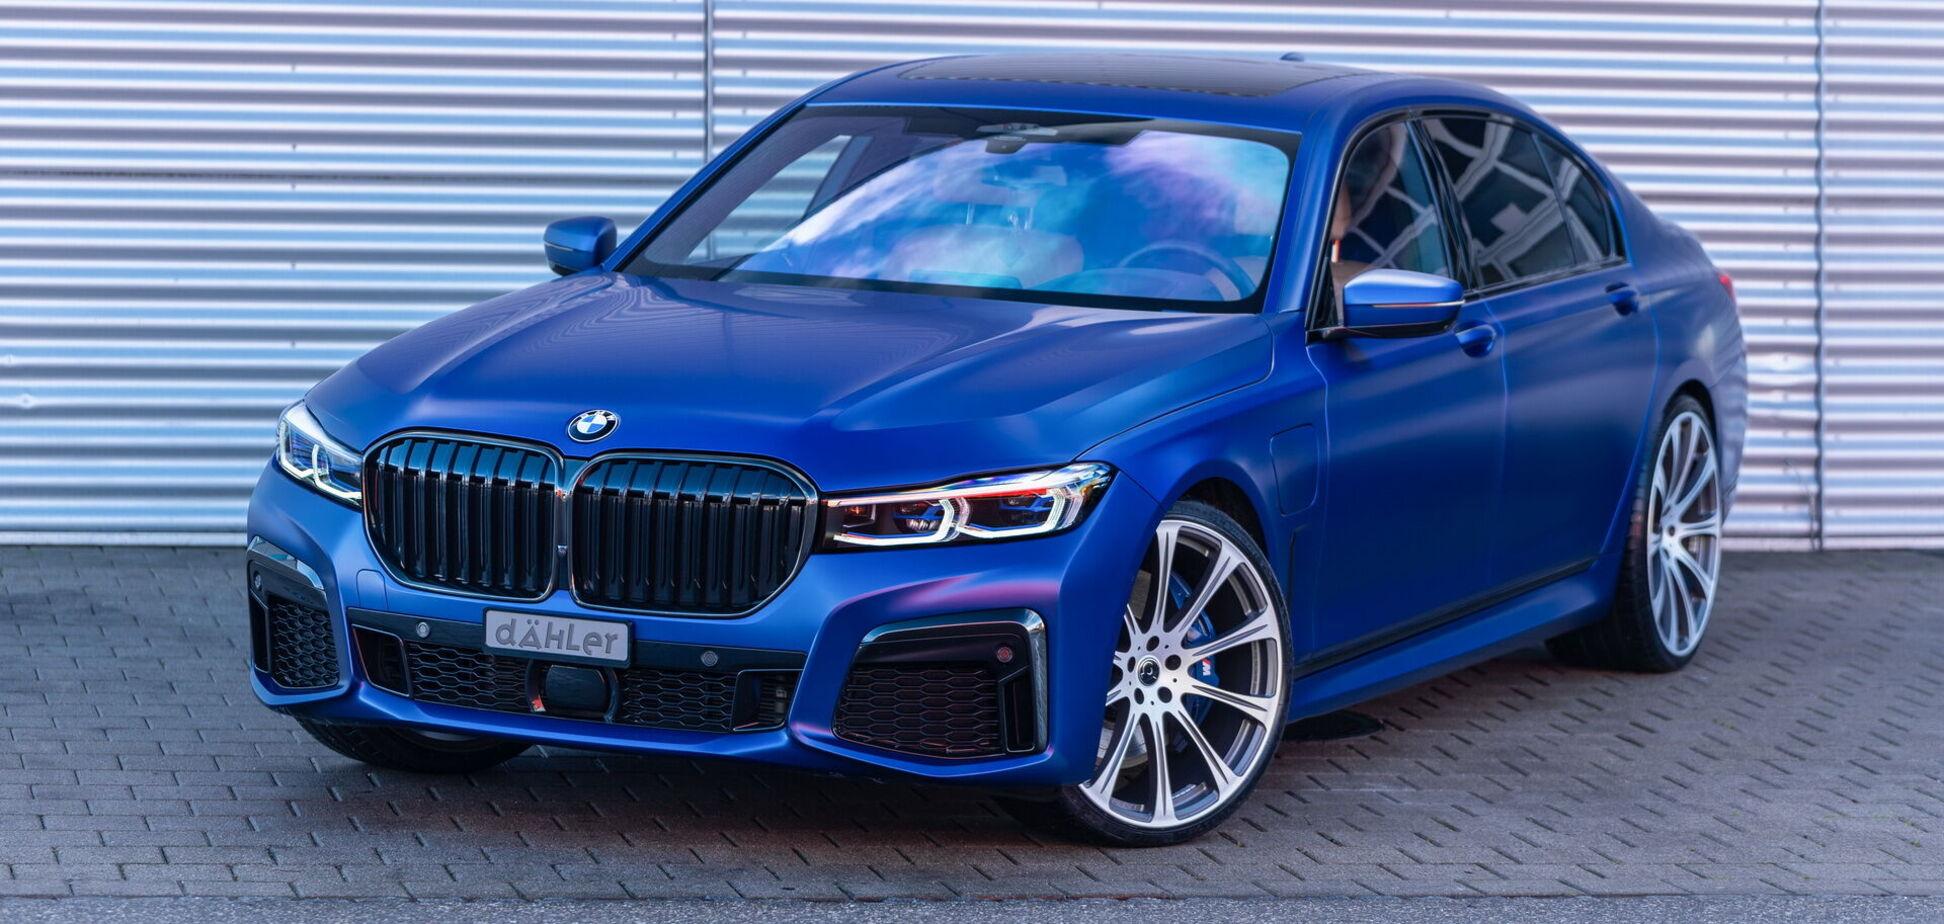 BMW 745Le xDrive сделали мощнее, чем M3 Competition